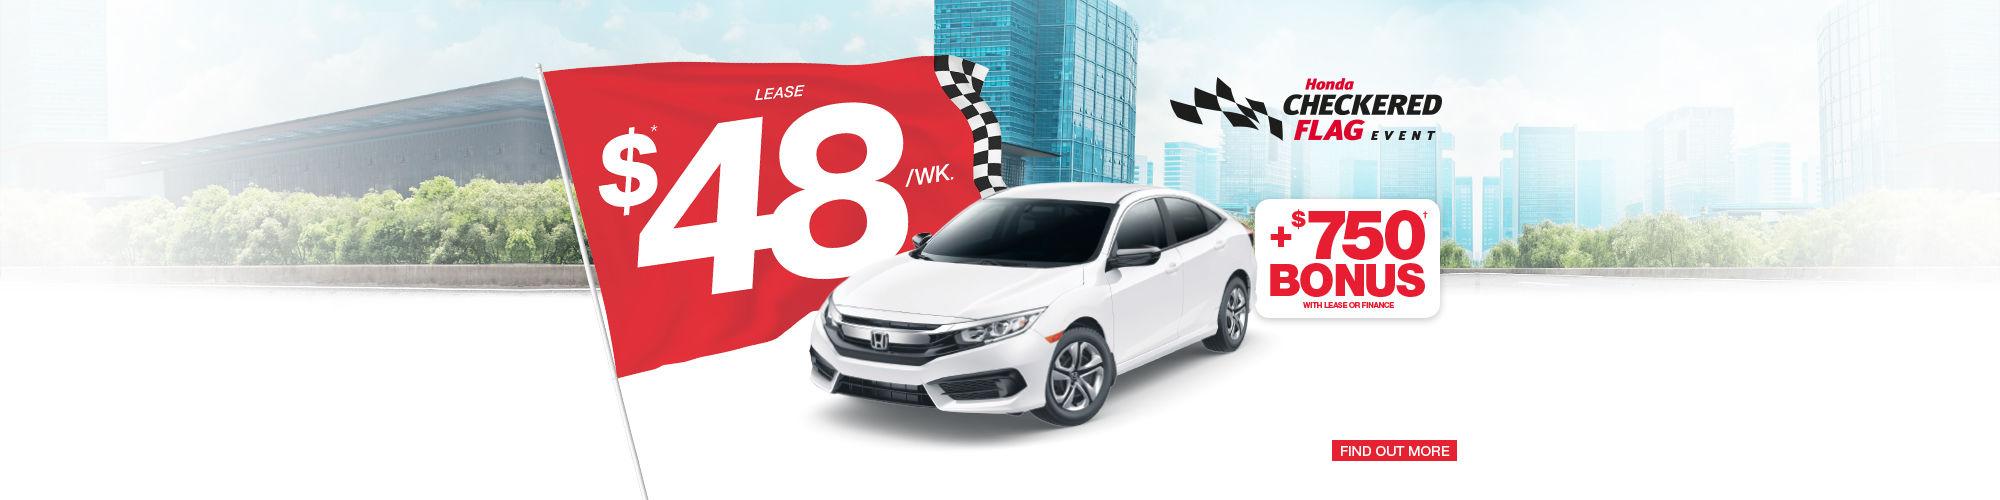 Honda Civic - Honda Checkered Flag